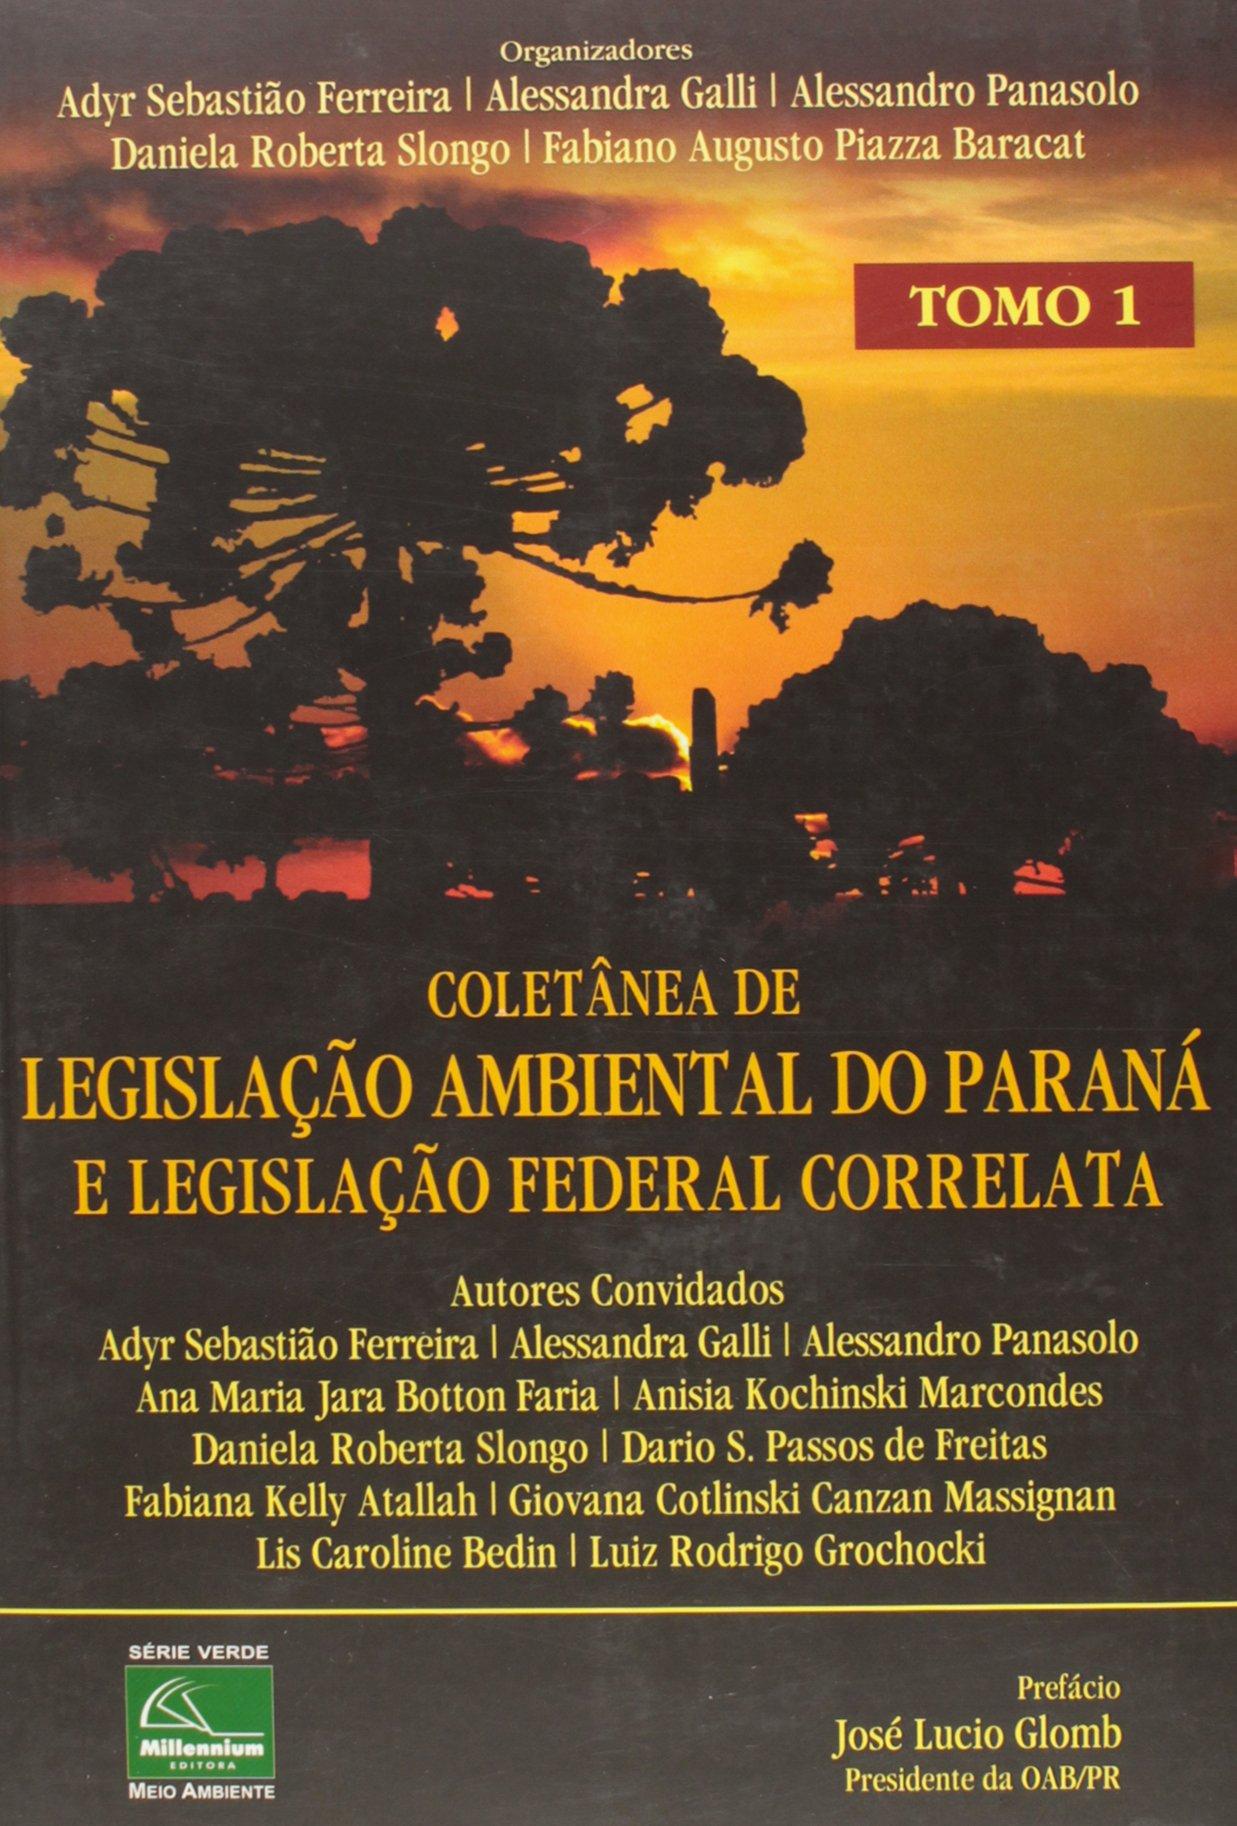 Read Online Colet‰nea de Legislacao Ambiental do Parana e Legislacao Federal Correlata - Tomo 1 pdf epub